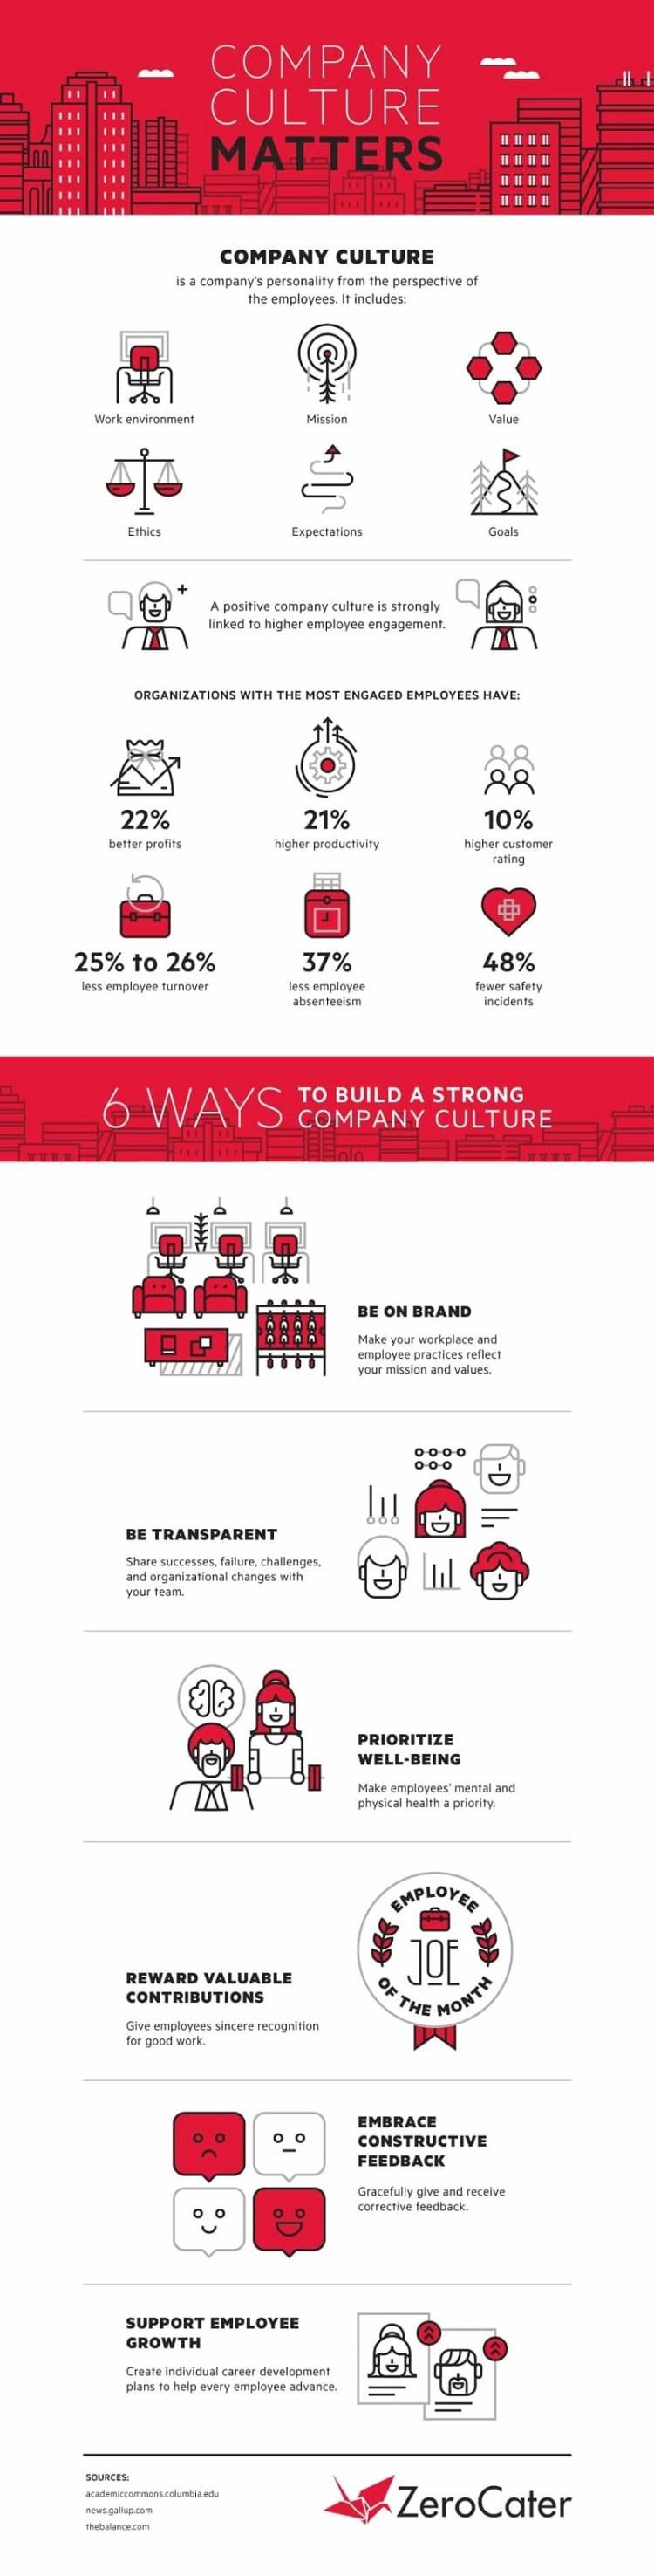 Company Culture Matters